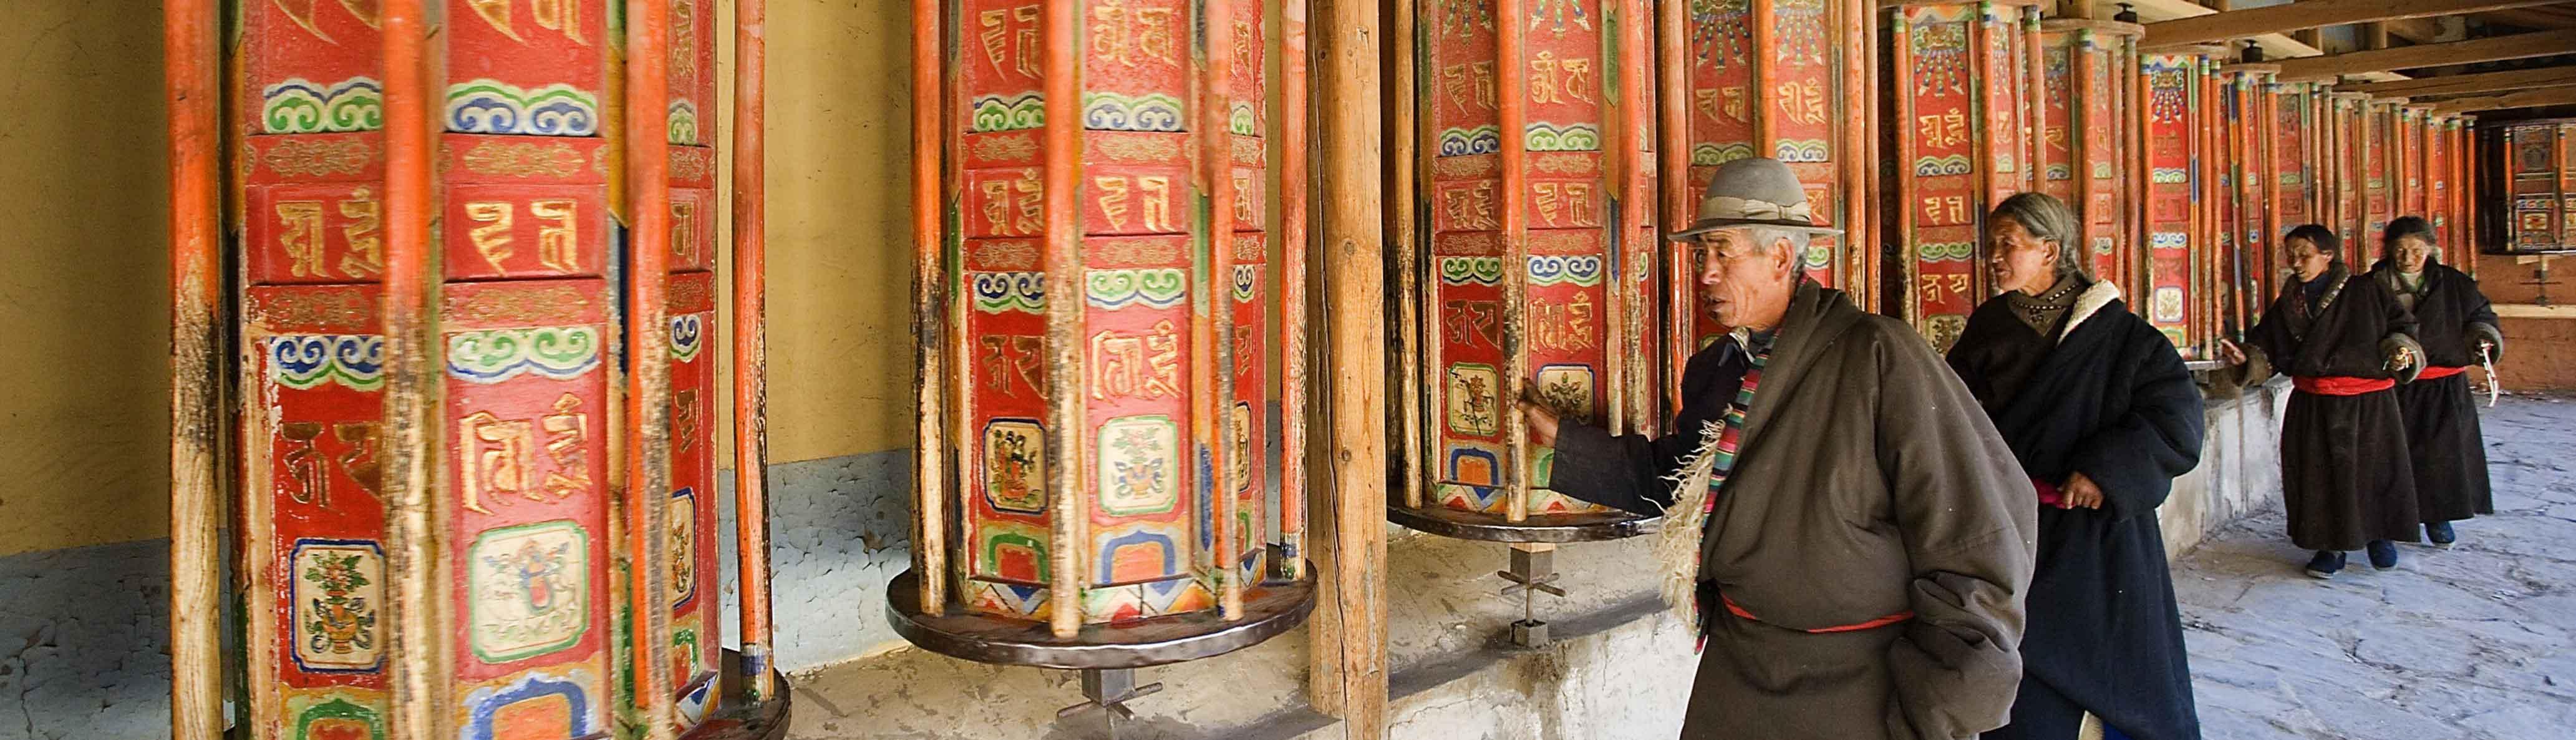 Explore China I Intrepid Travel